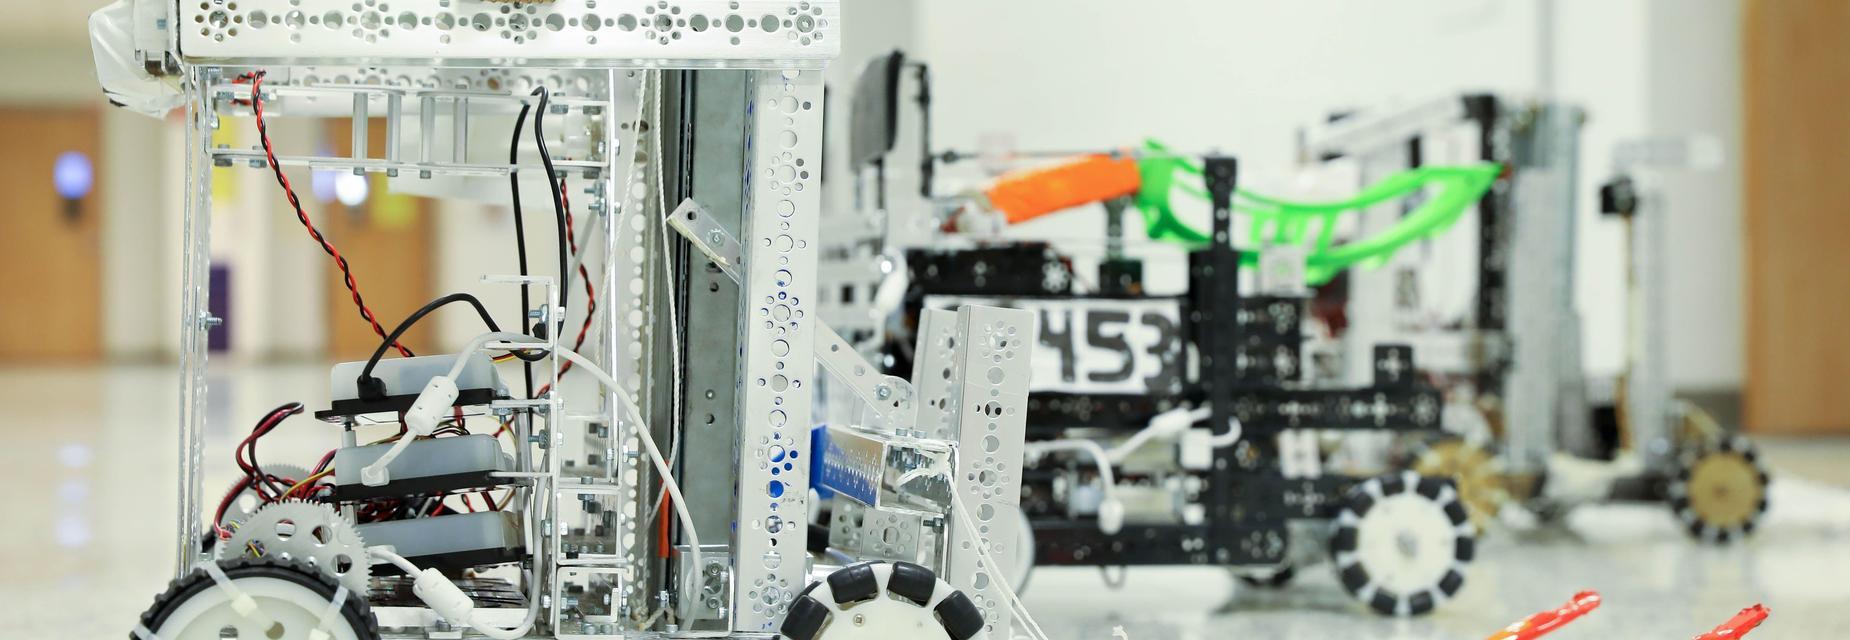 Robotics robot